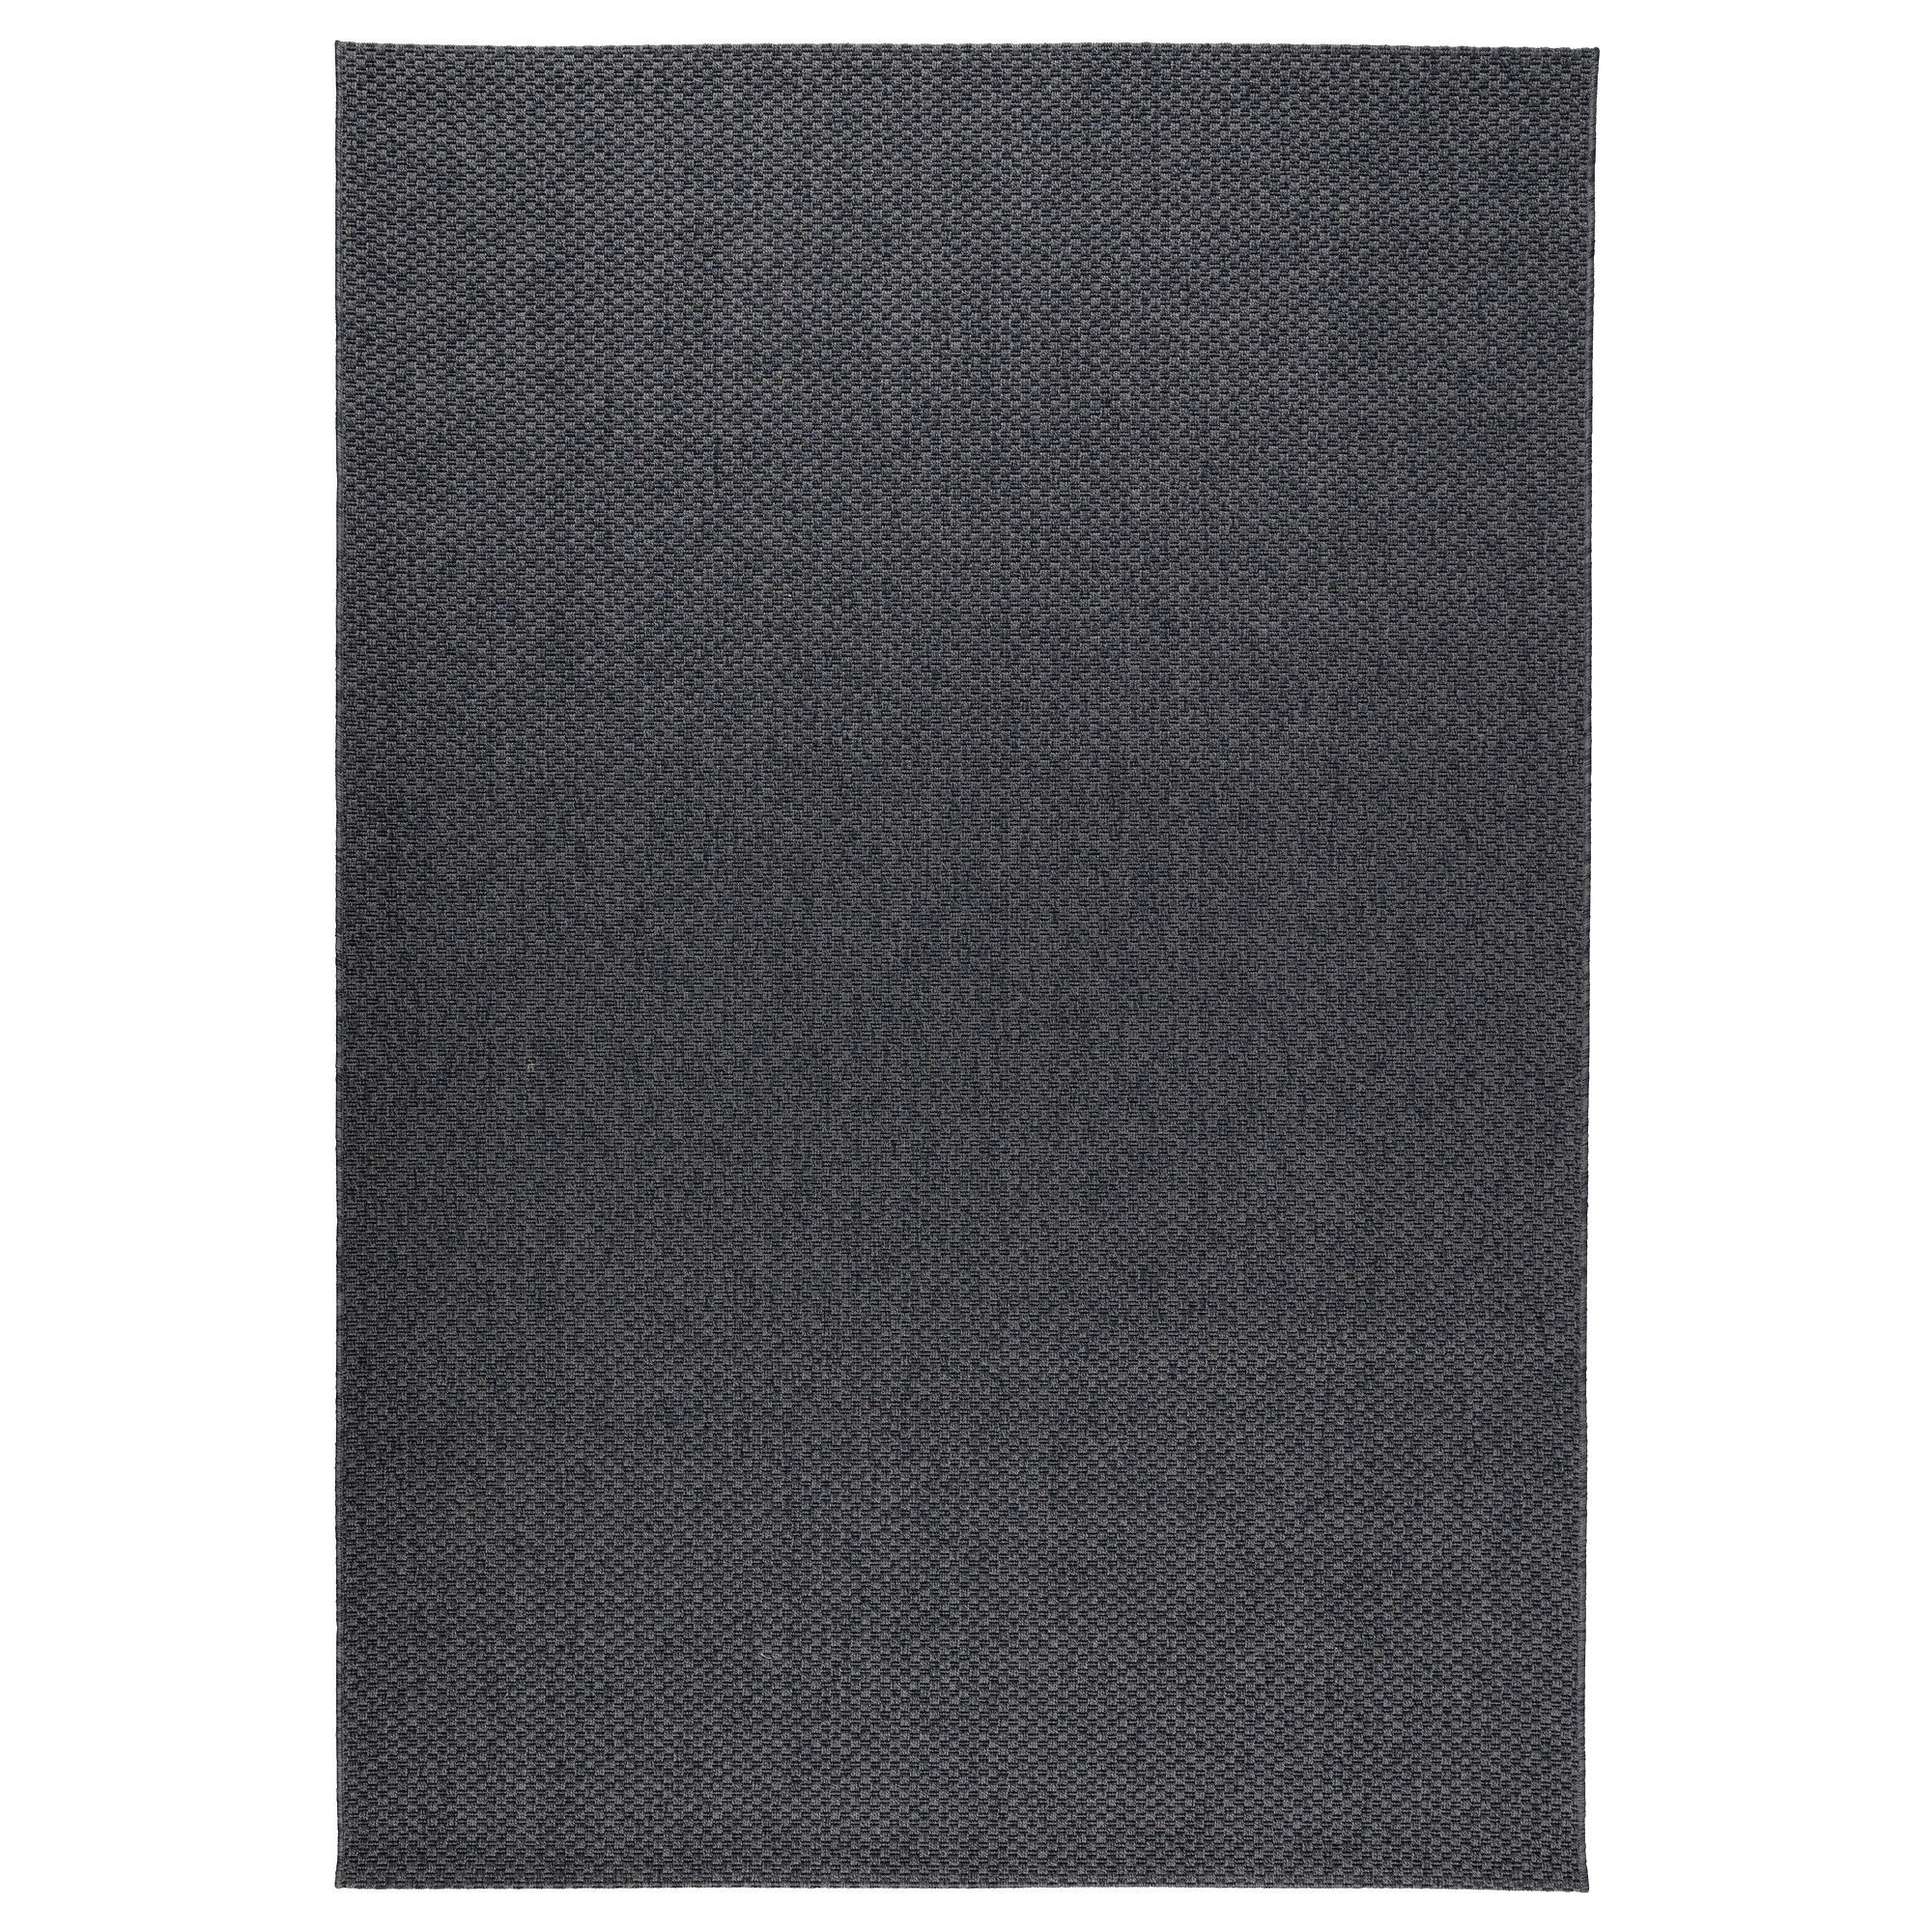 Ikea gran canaria detalles producto - Ikea catalogo alfombras ...